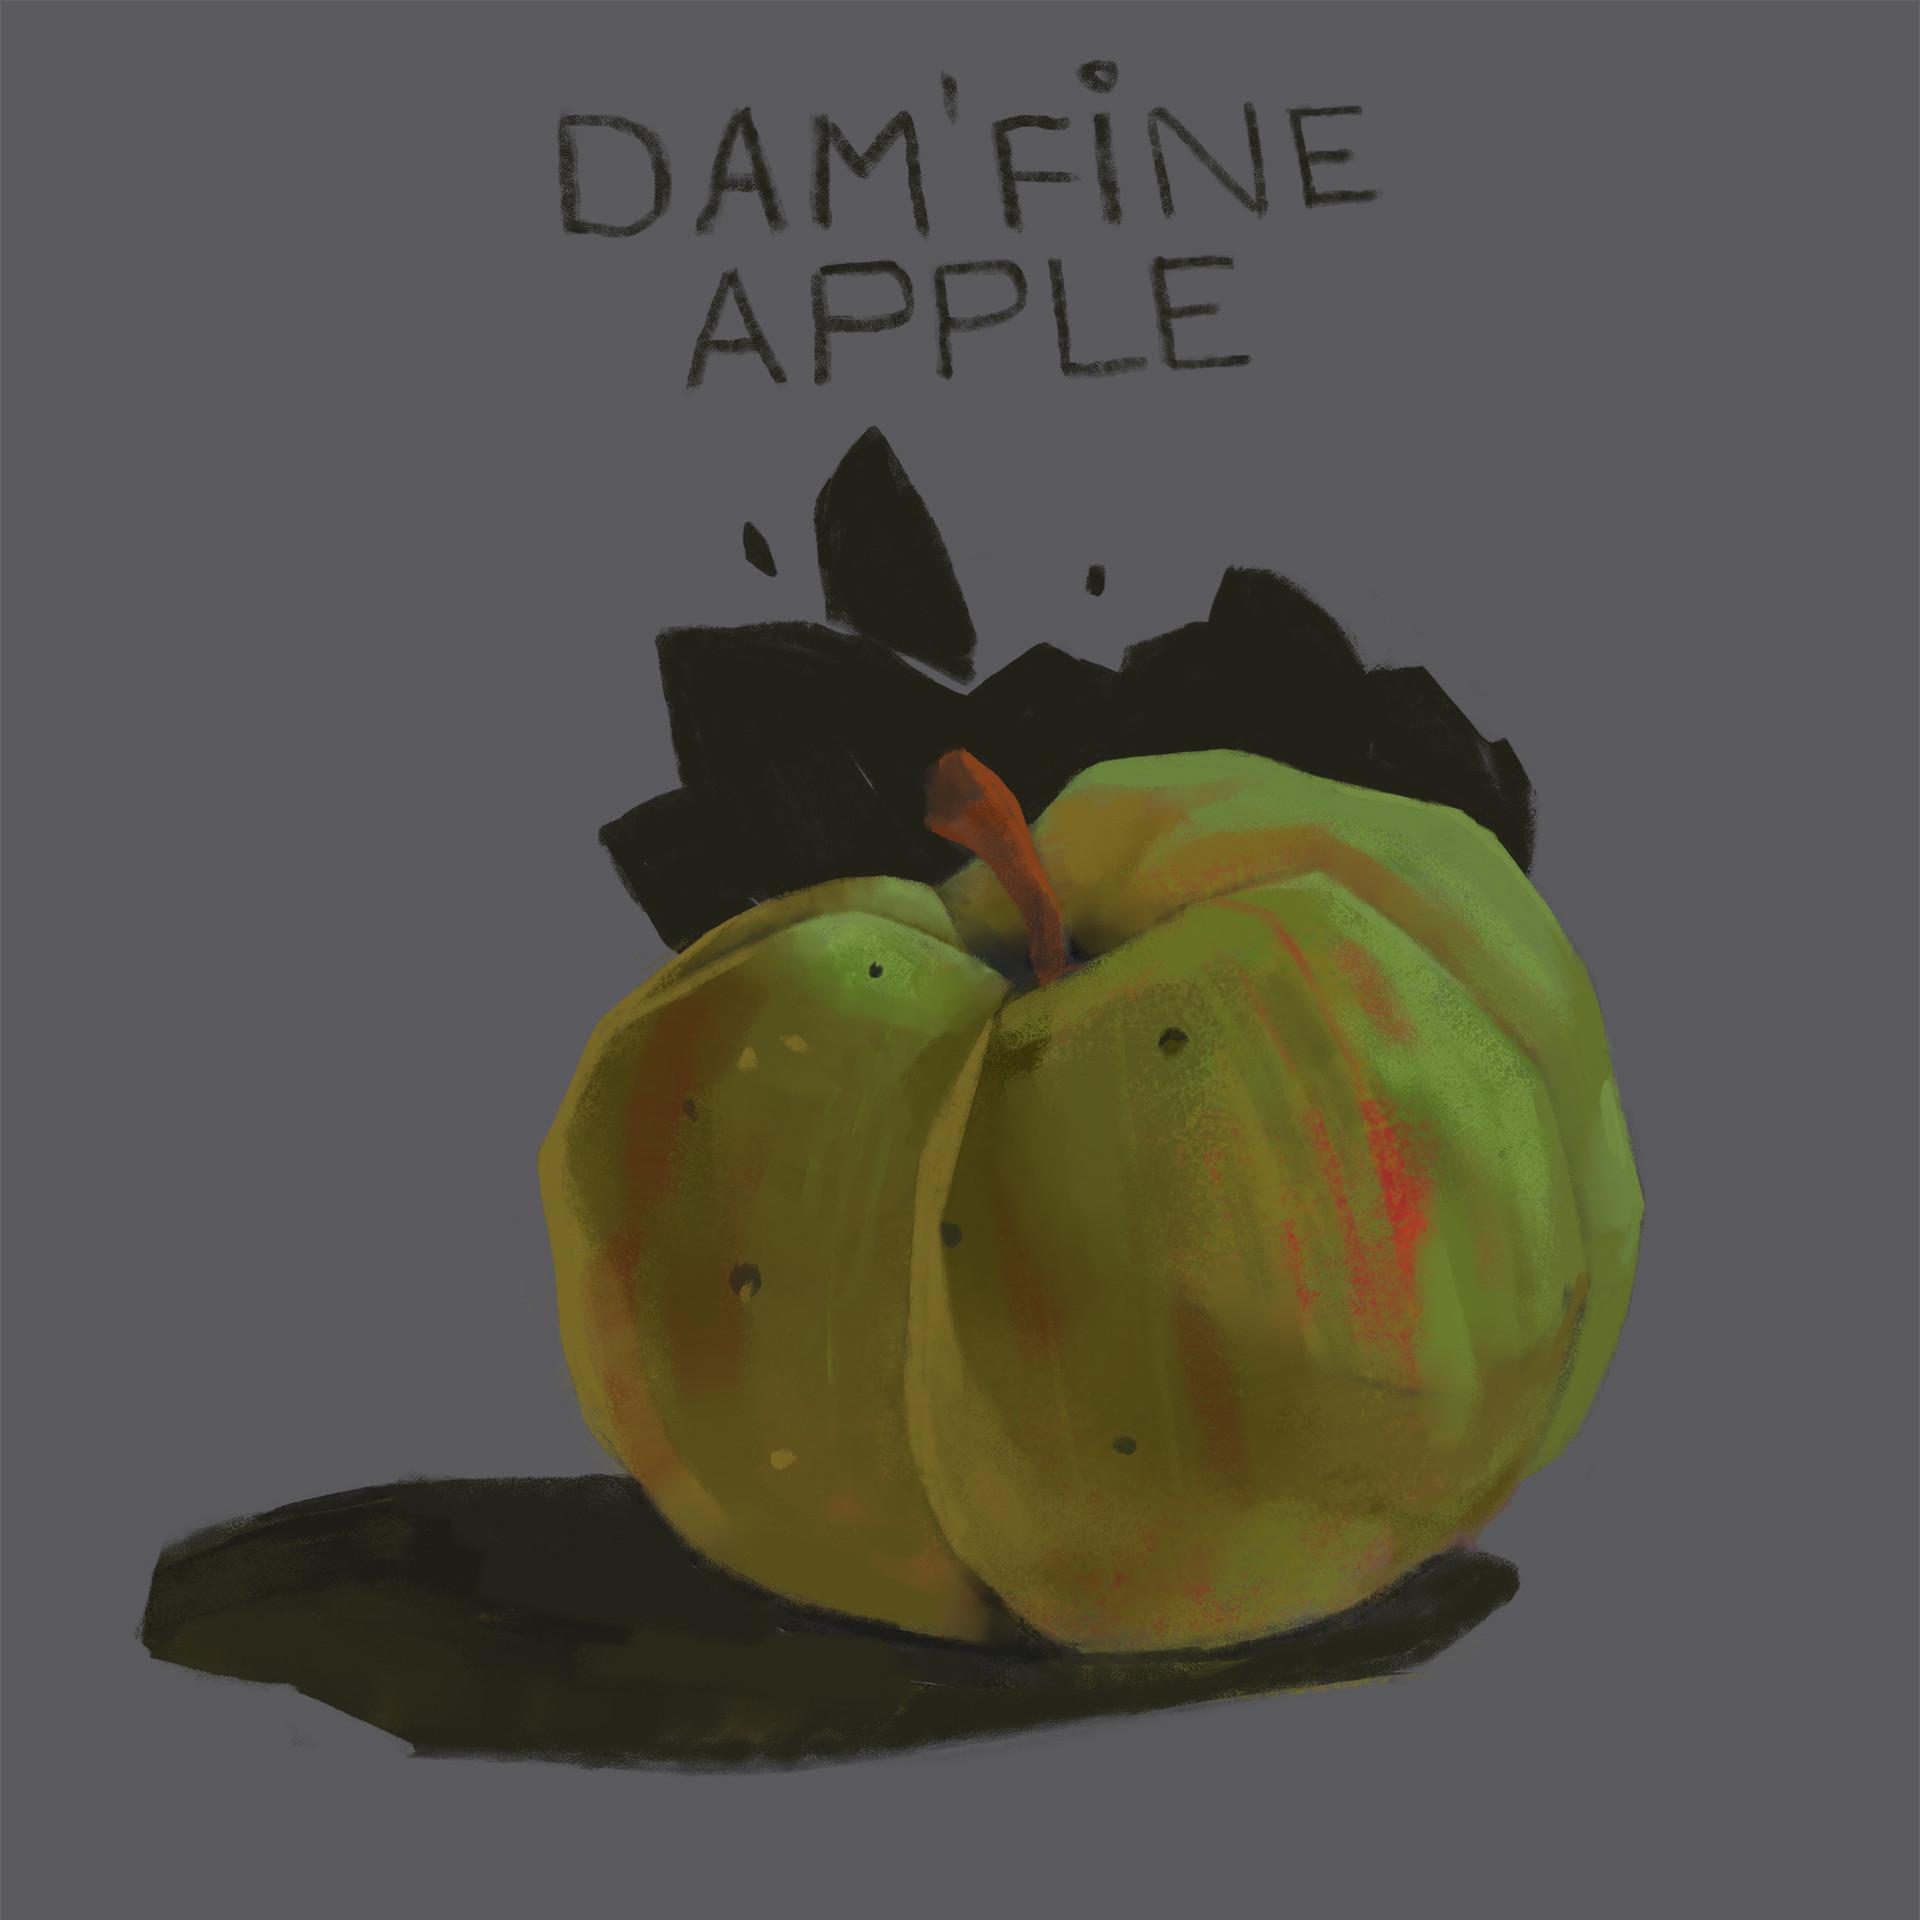 Michael loos damfine apple